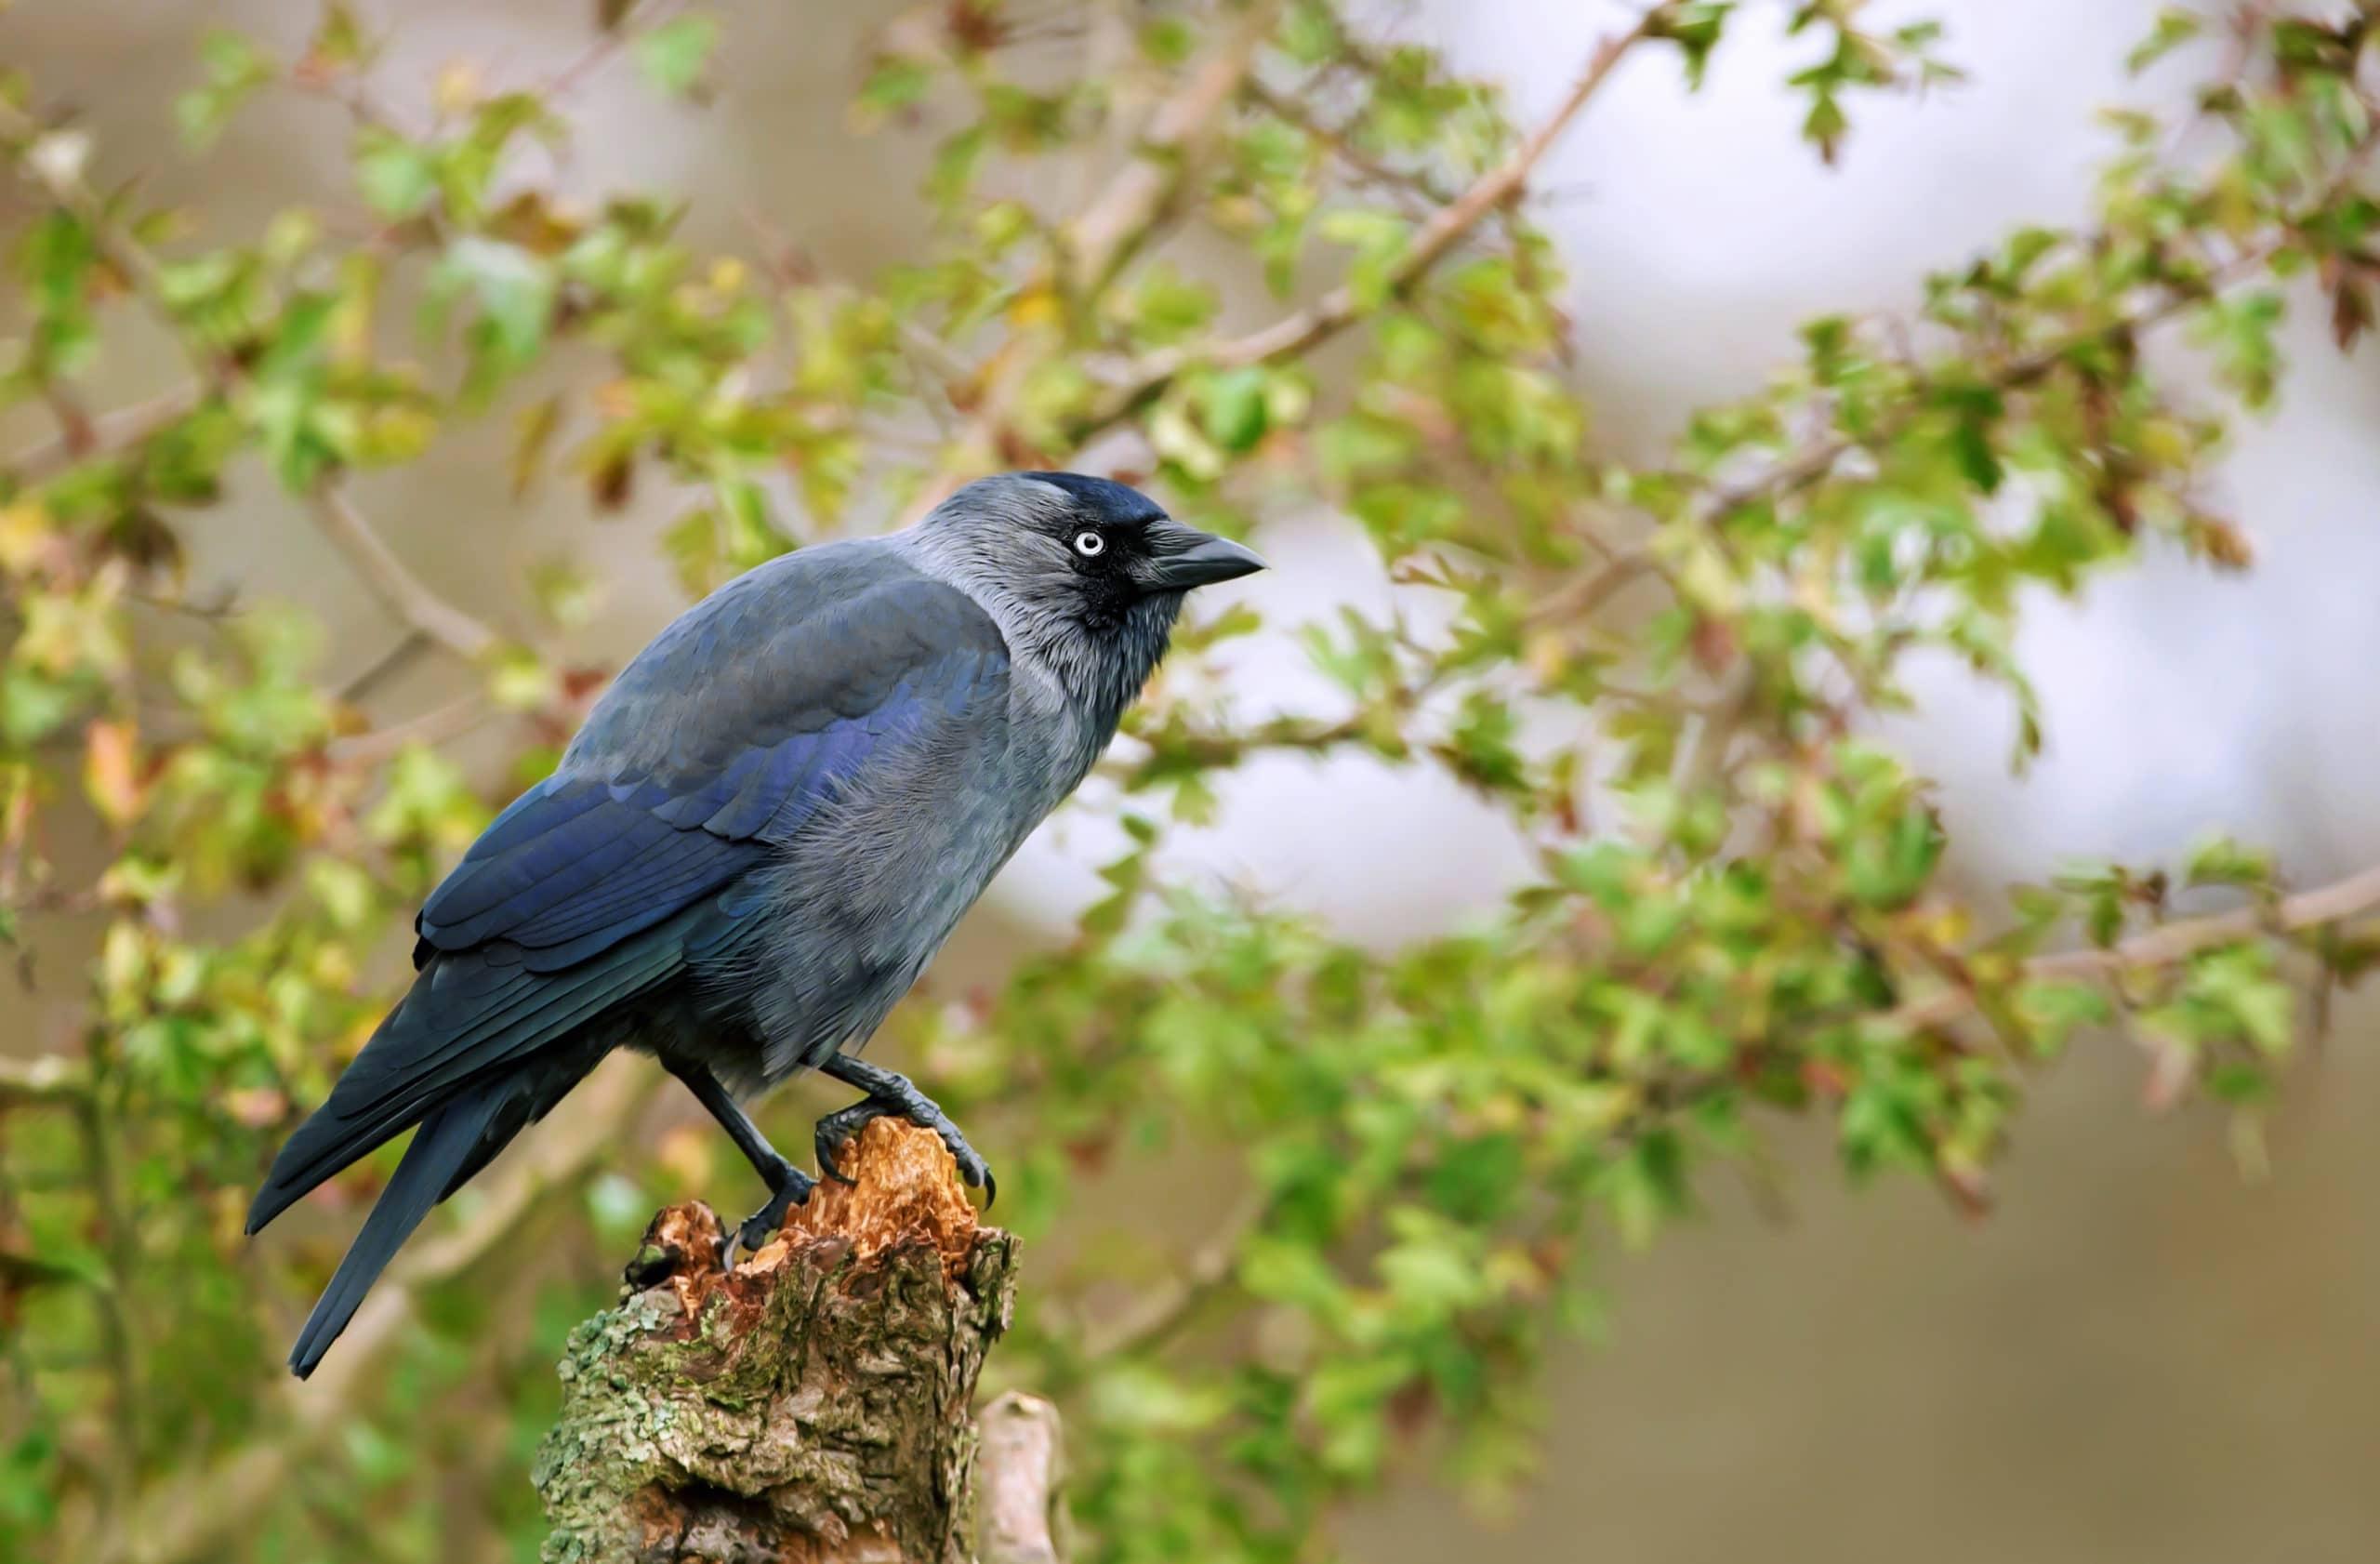 Jackdaw perching on a tree branch, UK.